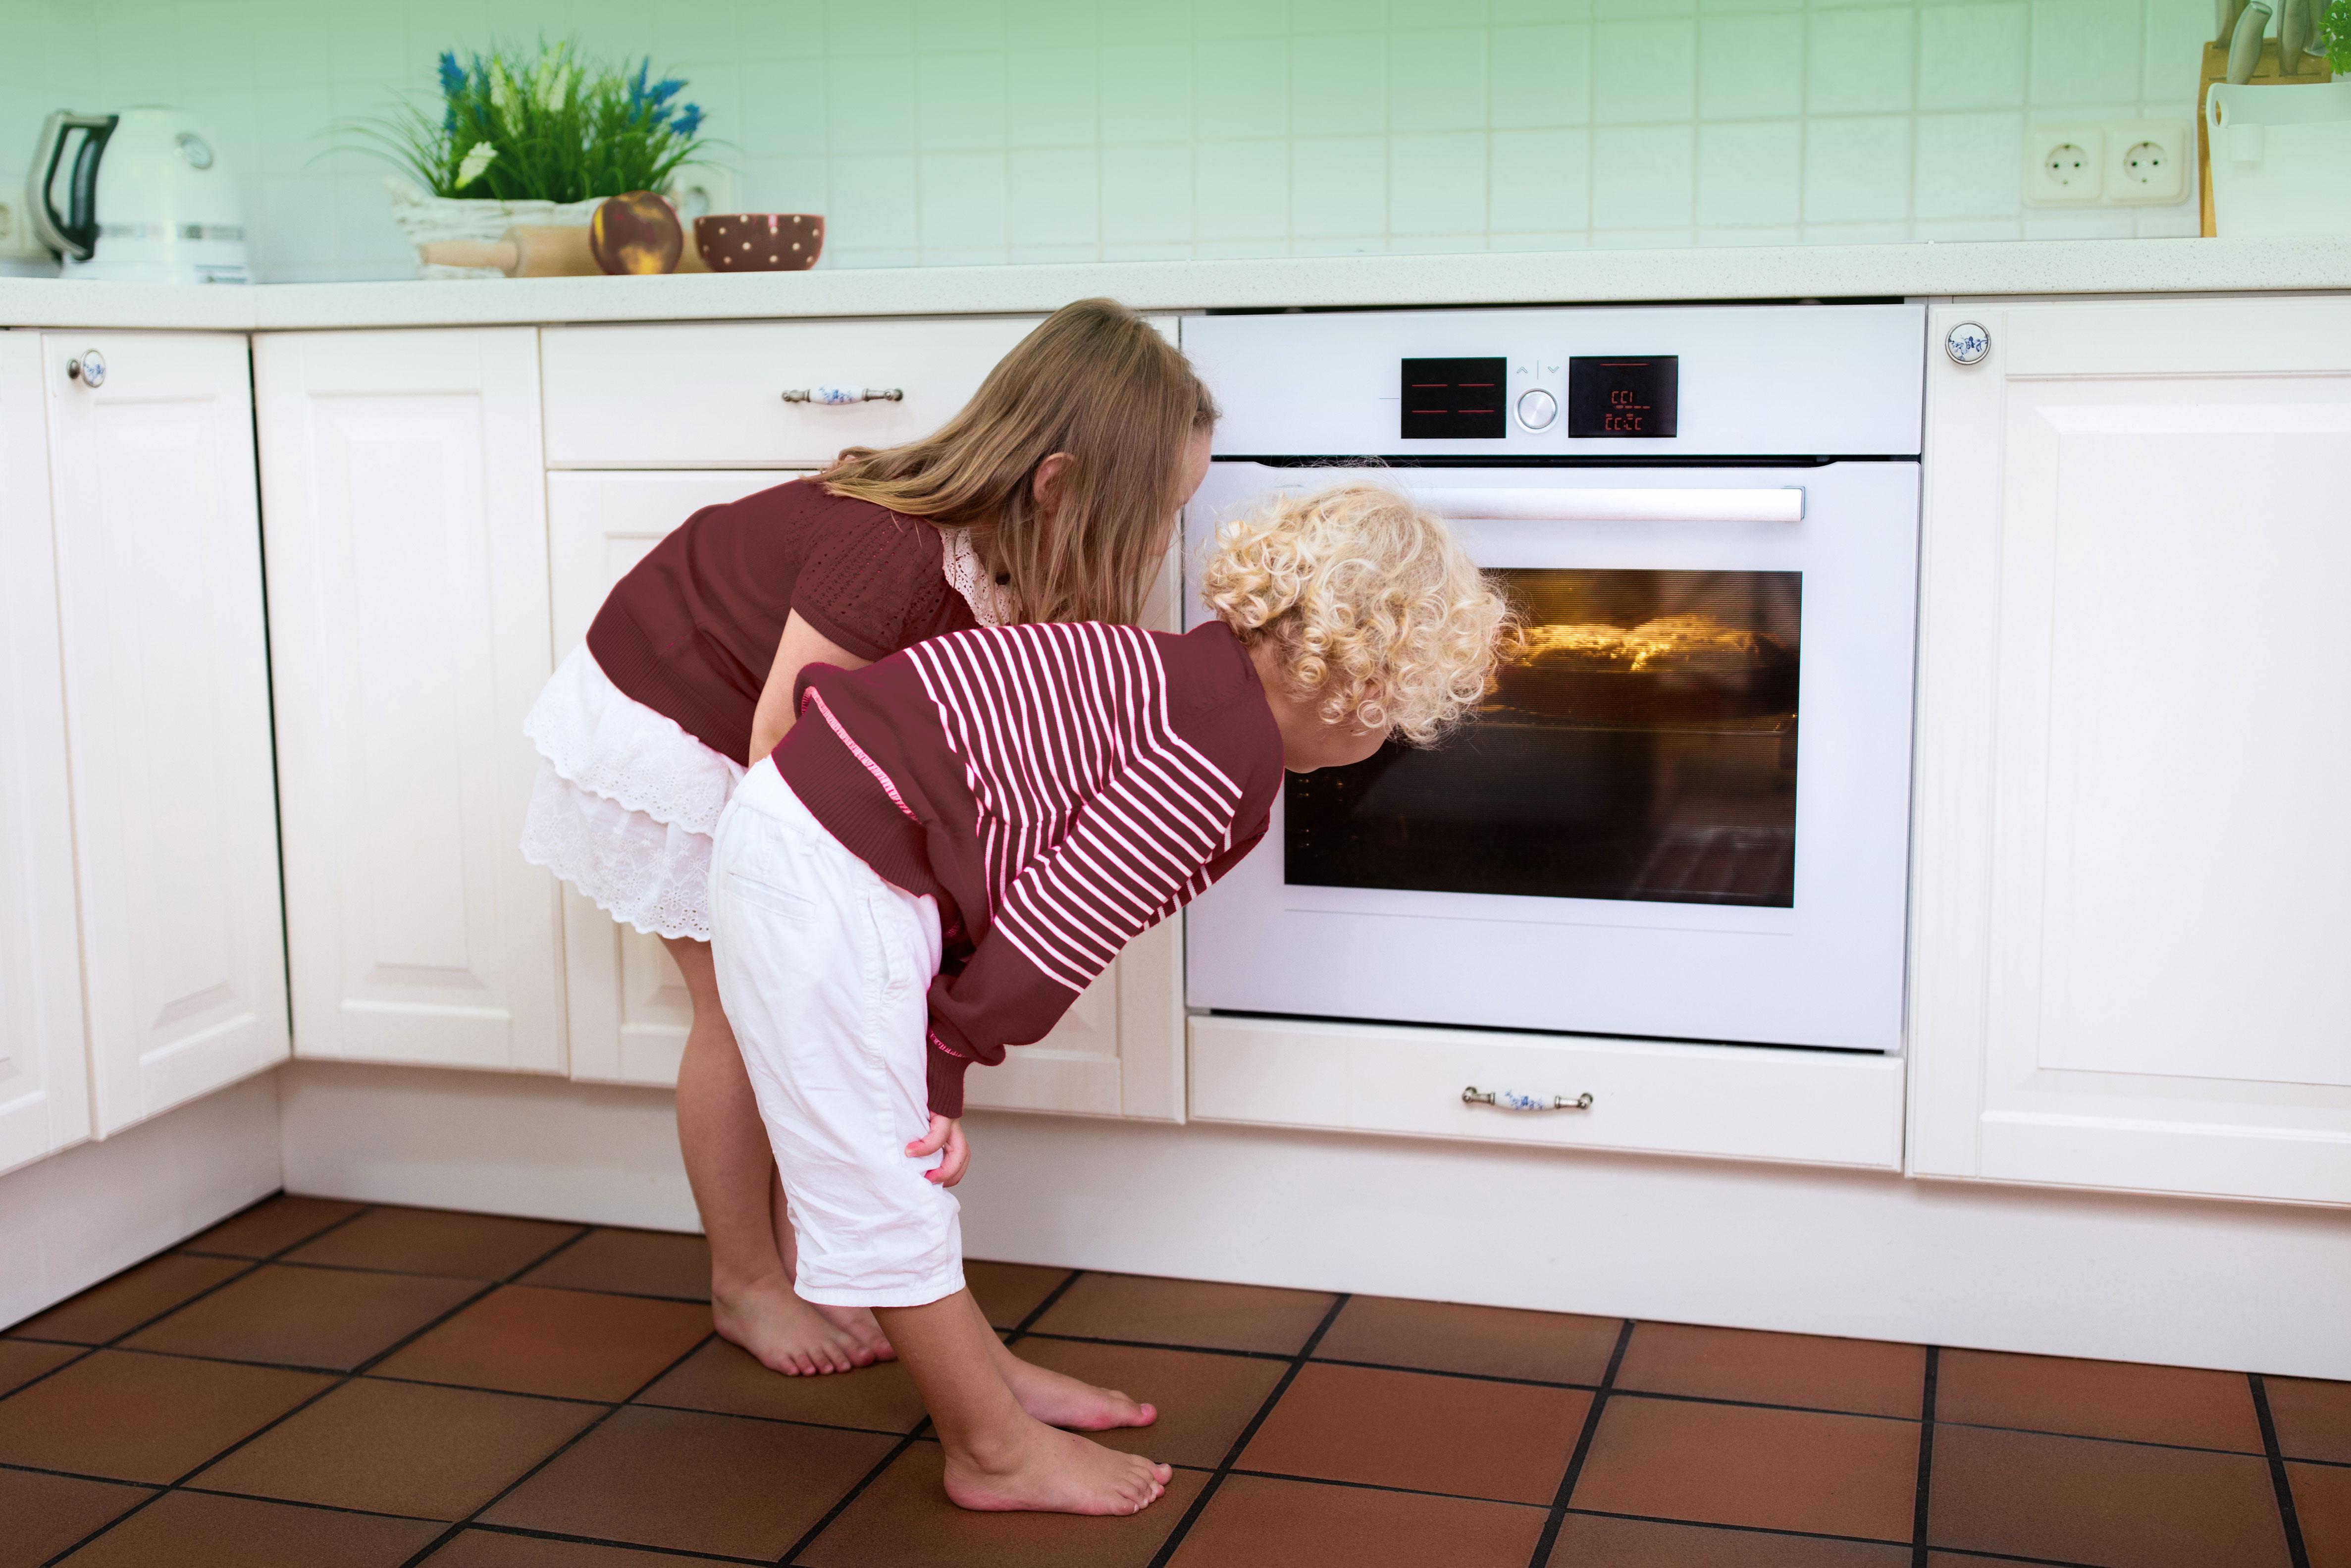 Horno de vapor vs convencional con cu l es mejor cocinar for Cocinar con horno de vapor